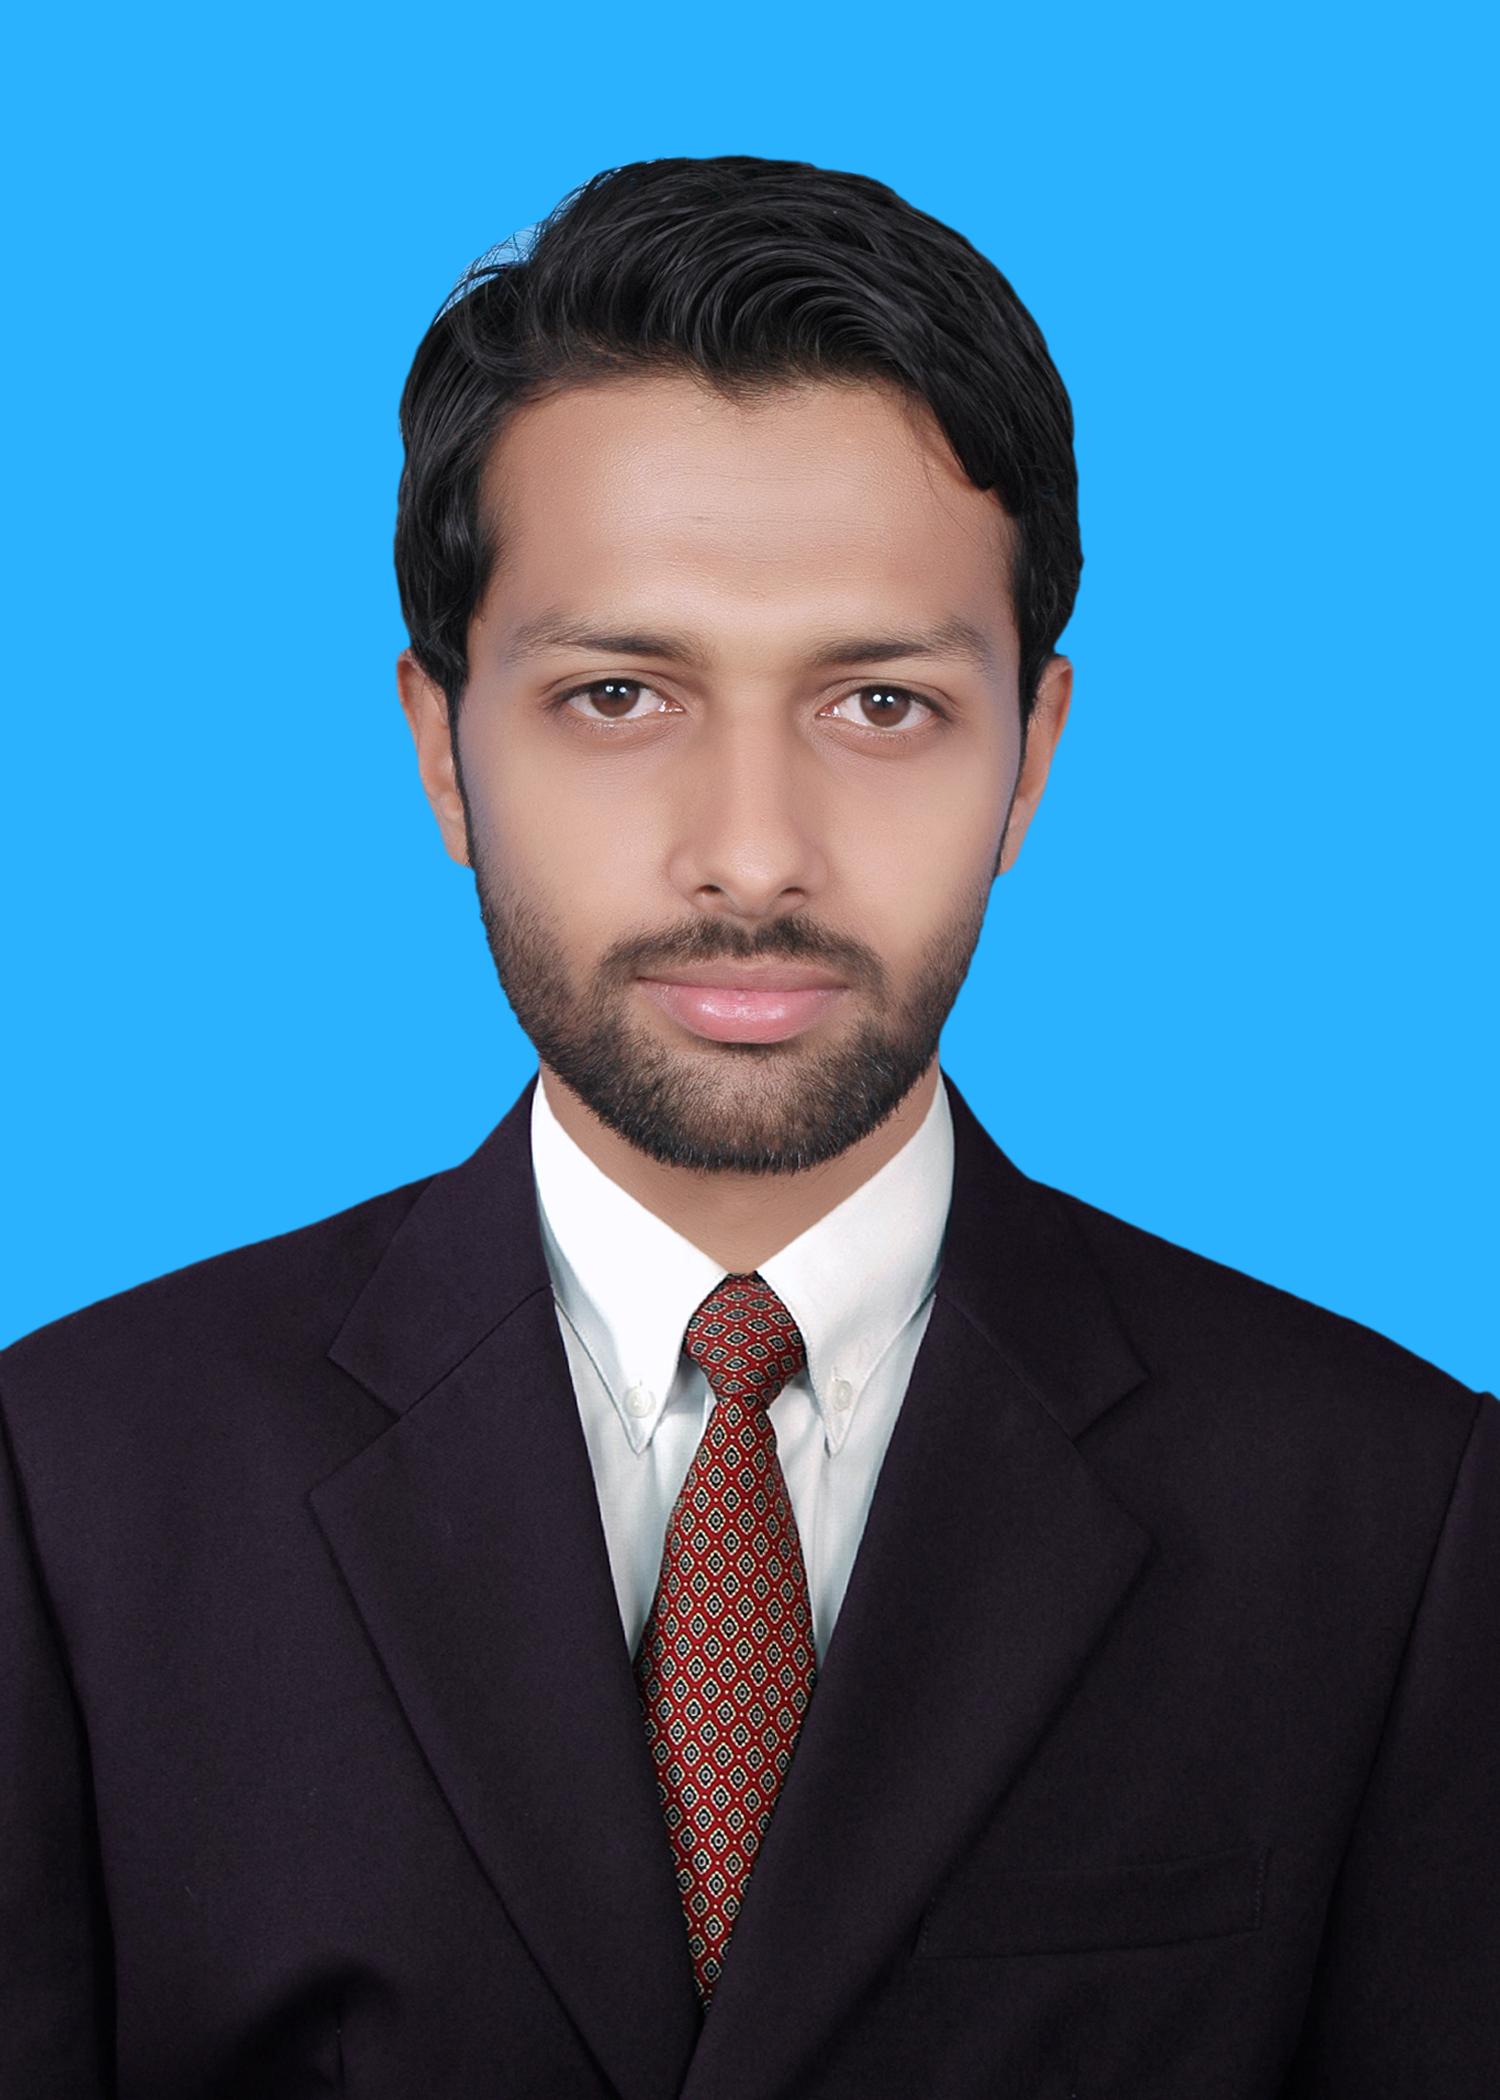 Hamd avatar